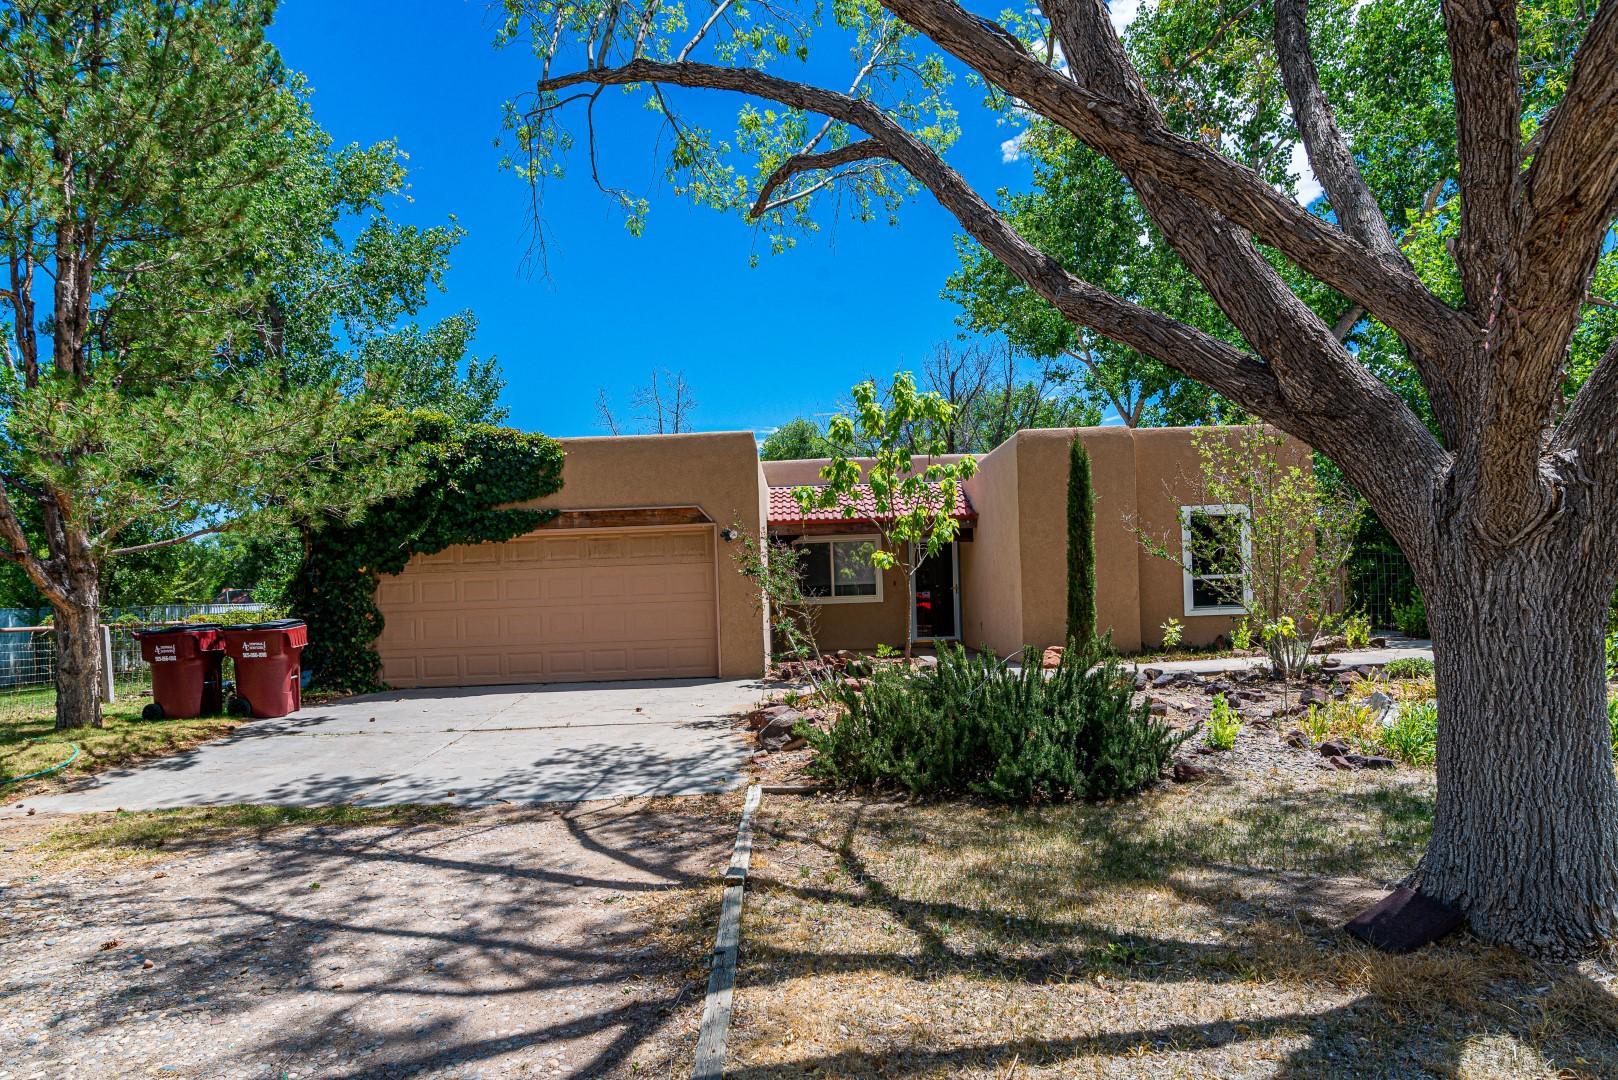 1035 CAMINO DE CHAVEZ Place Property Photo - Bosque Farms, NM real estate listing